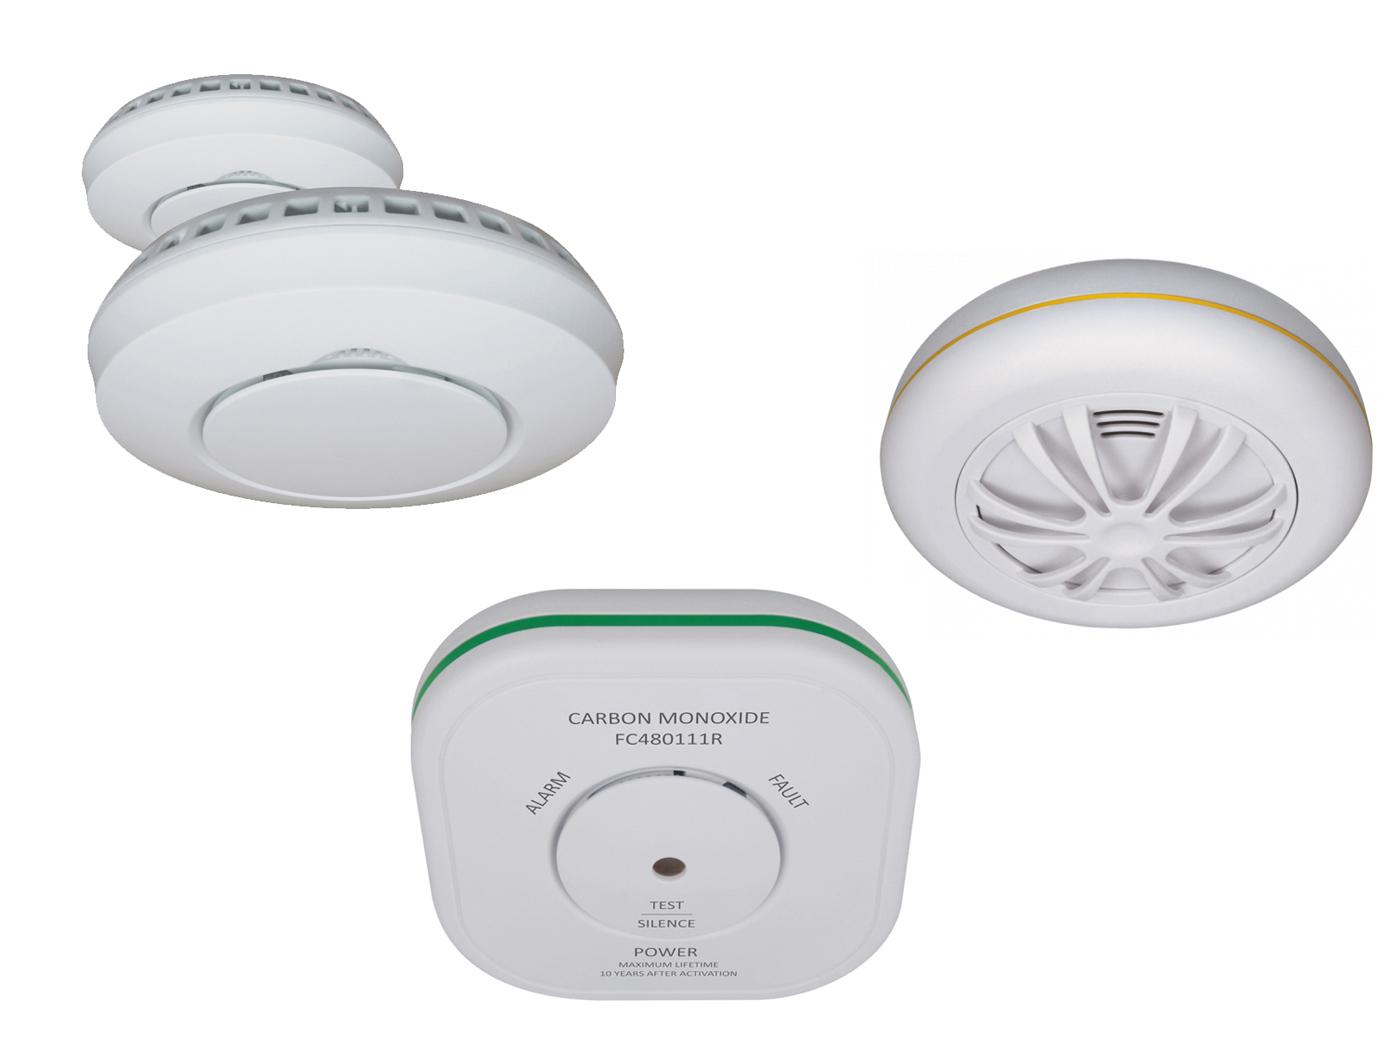 Réseau alarmmelderset  2 funkrauchmelder + 1 détecteur de chaleur + 1 gaswarnmelder